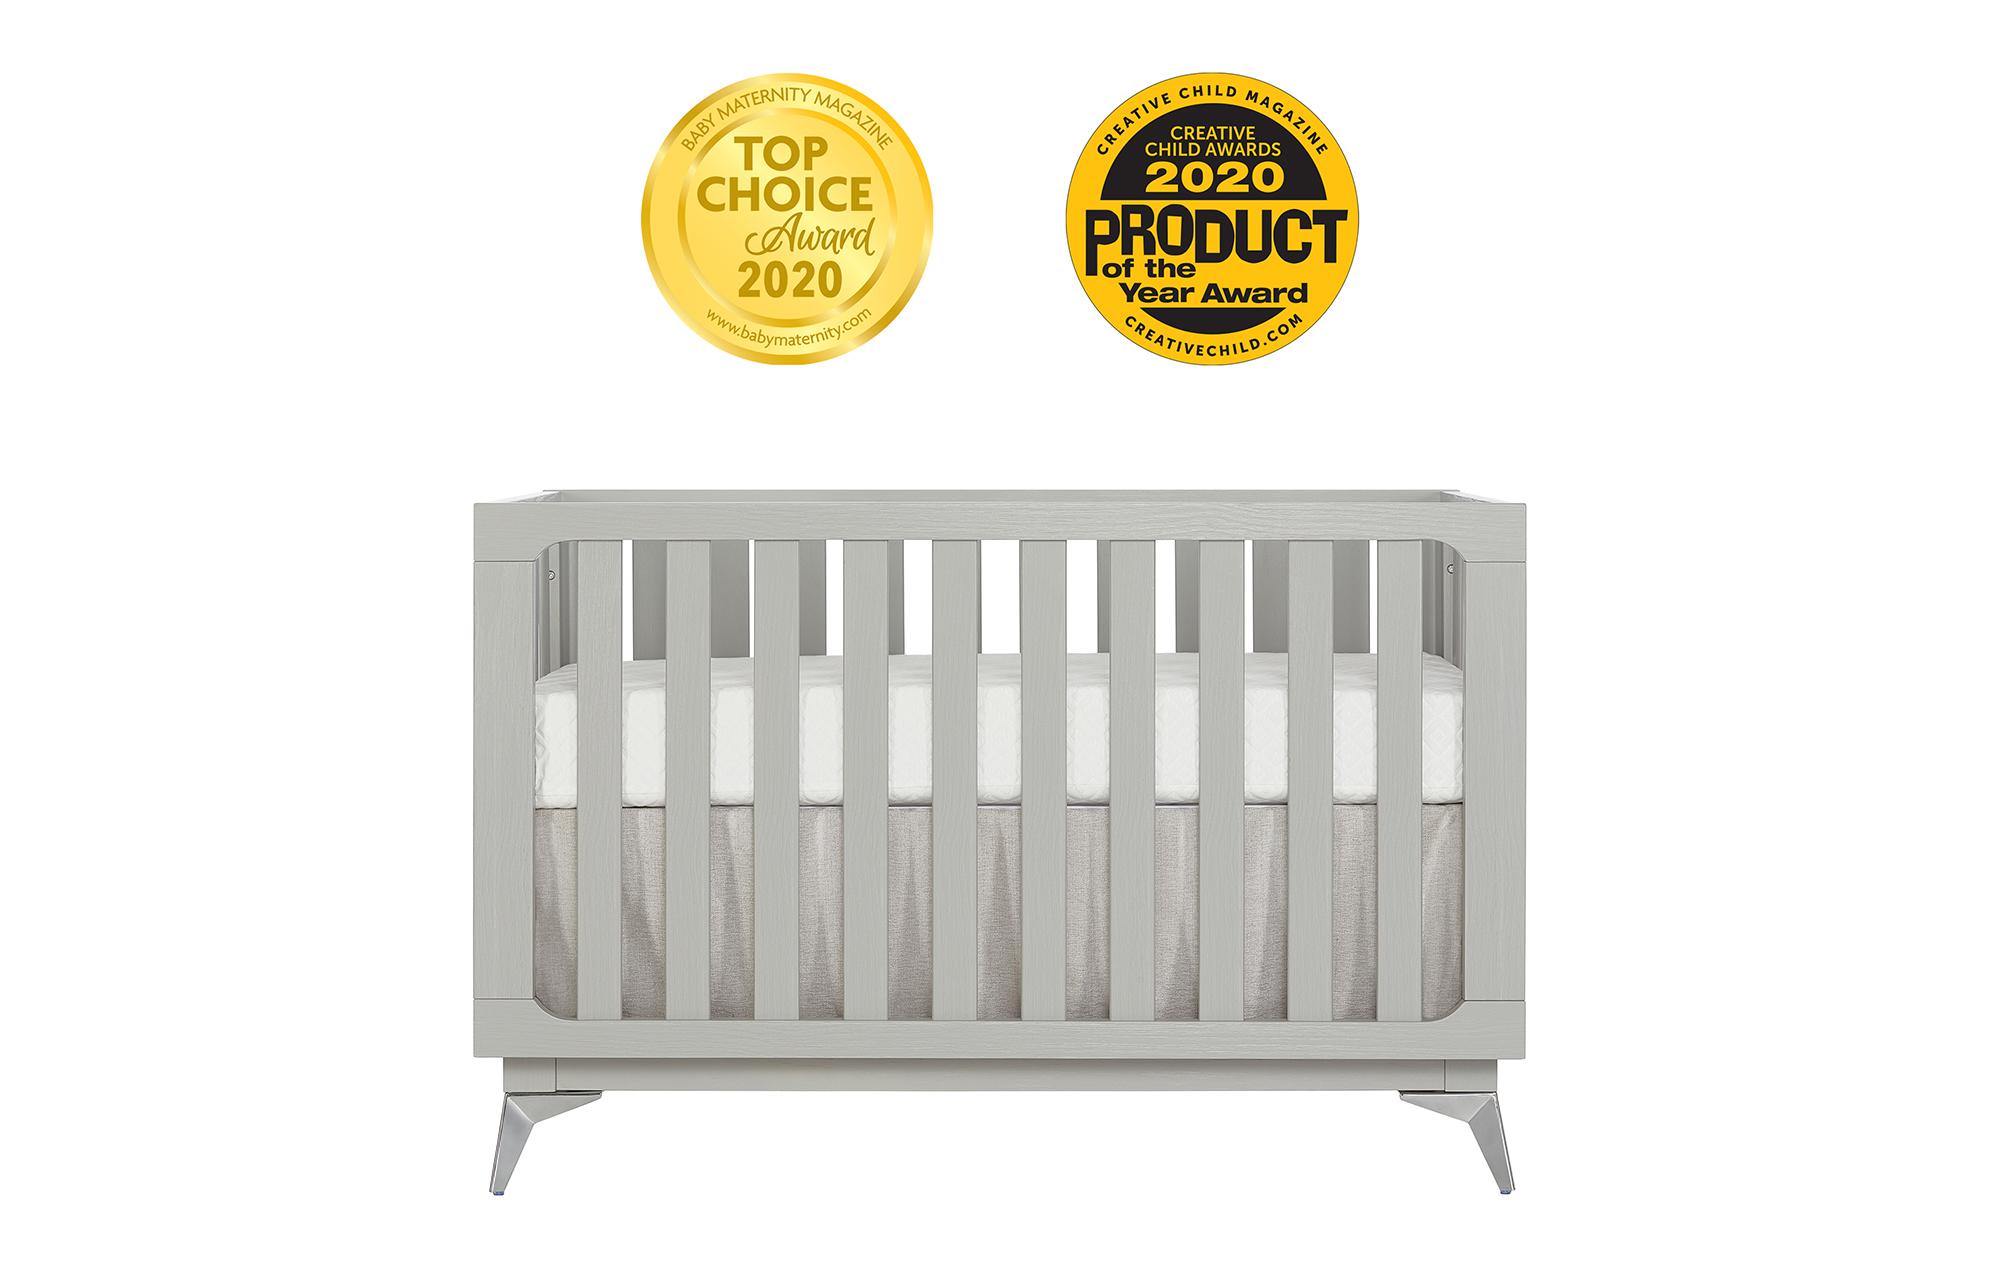 770BR_PG Ultra Modern Crib Awards